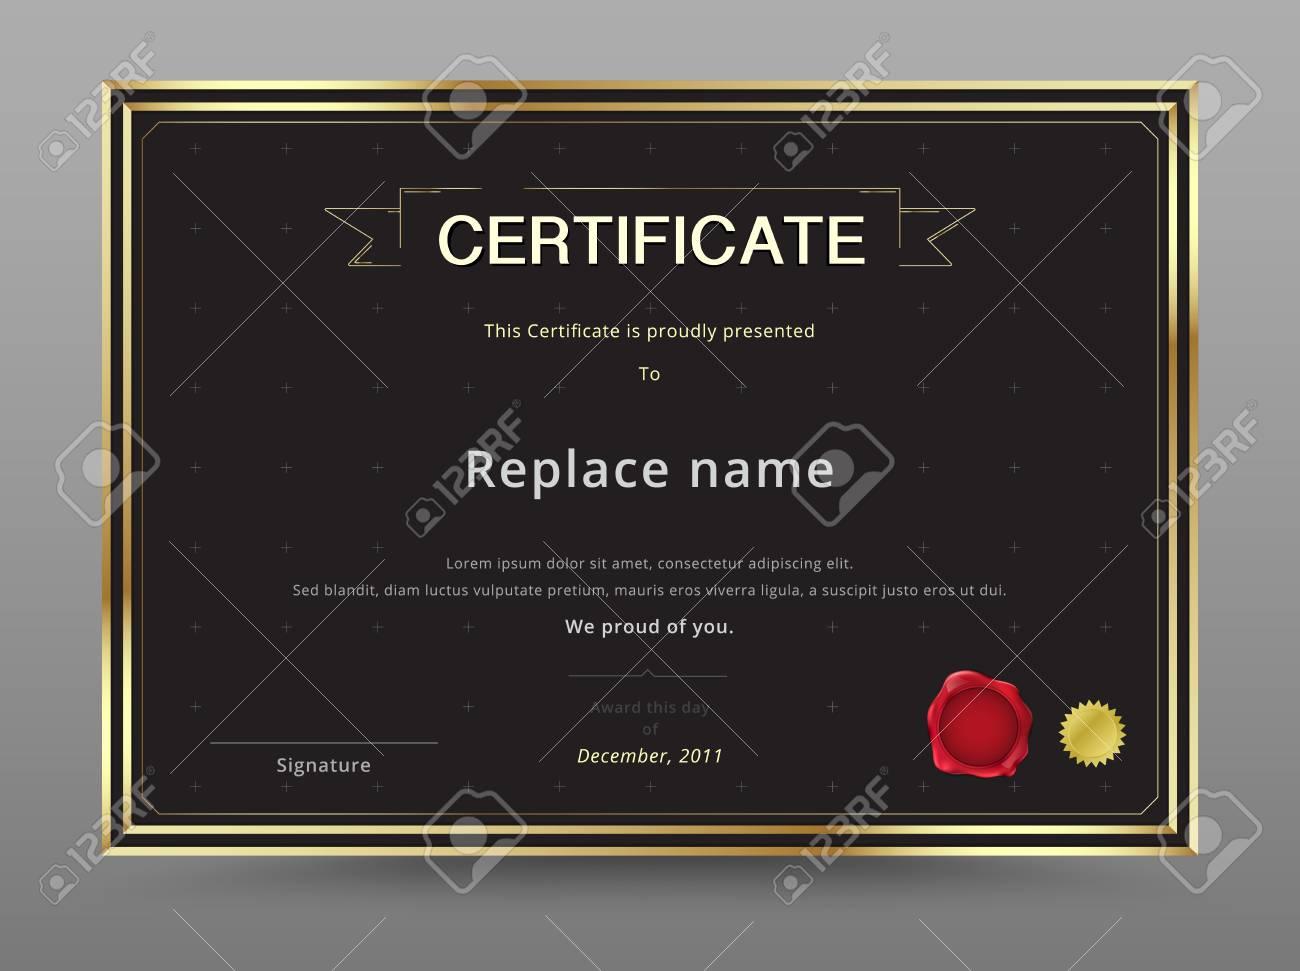 elegant certificate template design gold and black color guarantee